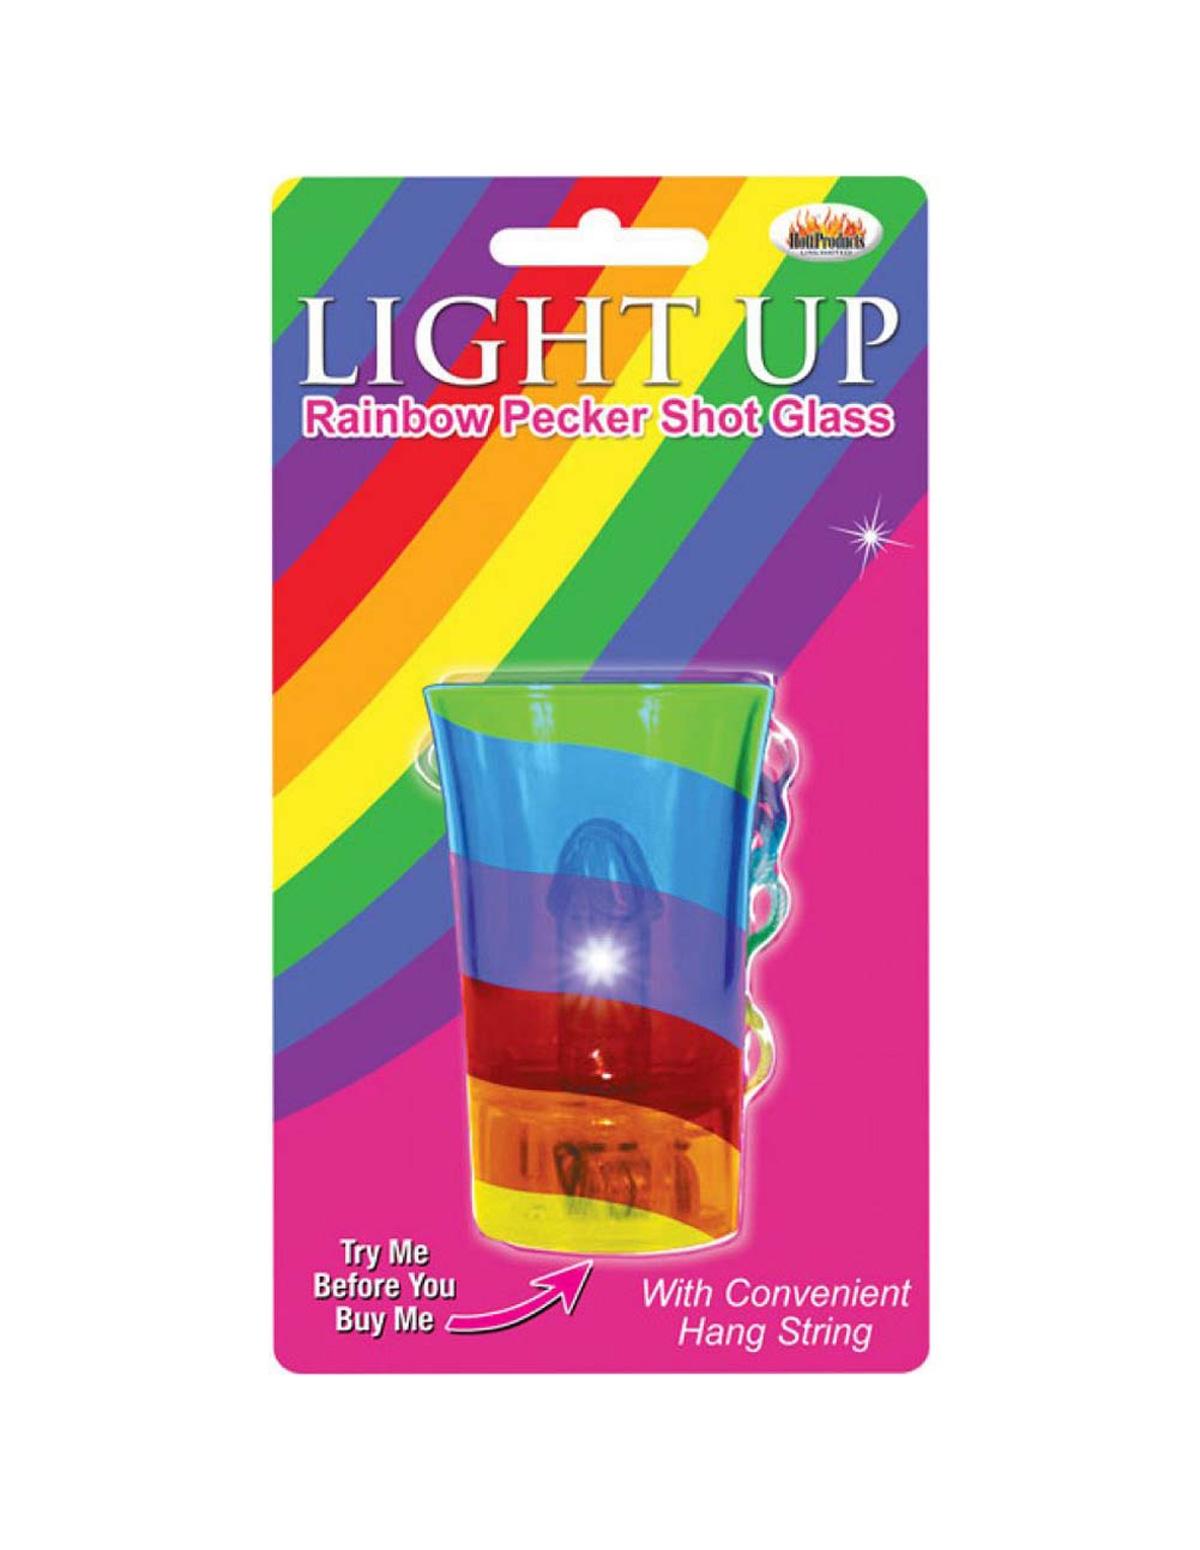 Light Up Rainbow Pecker Shotglass